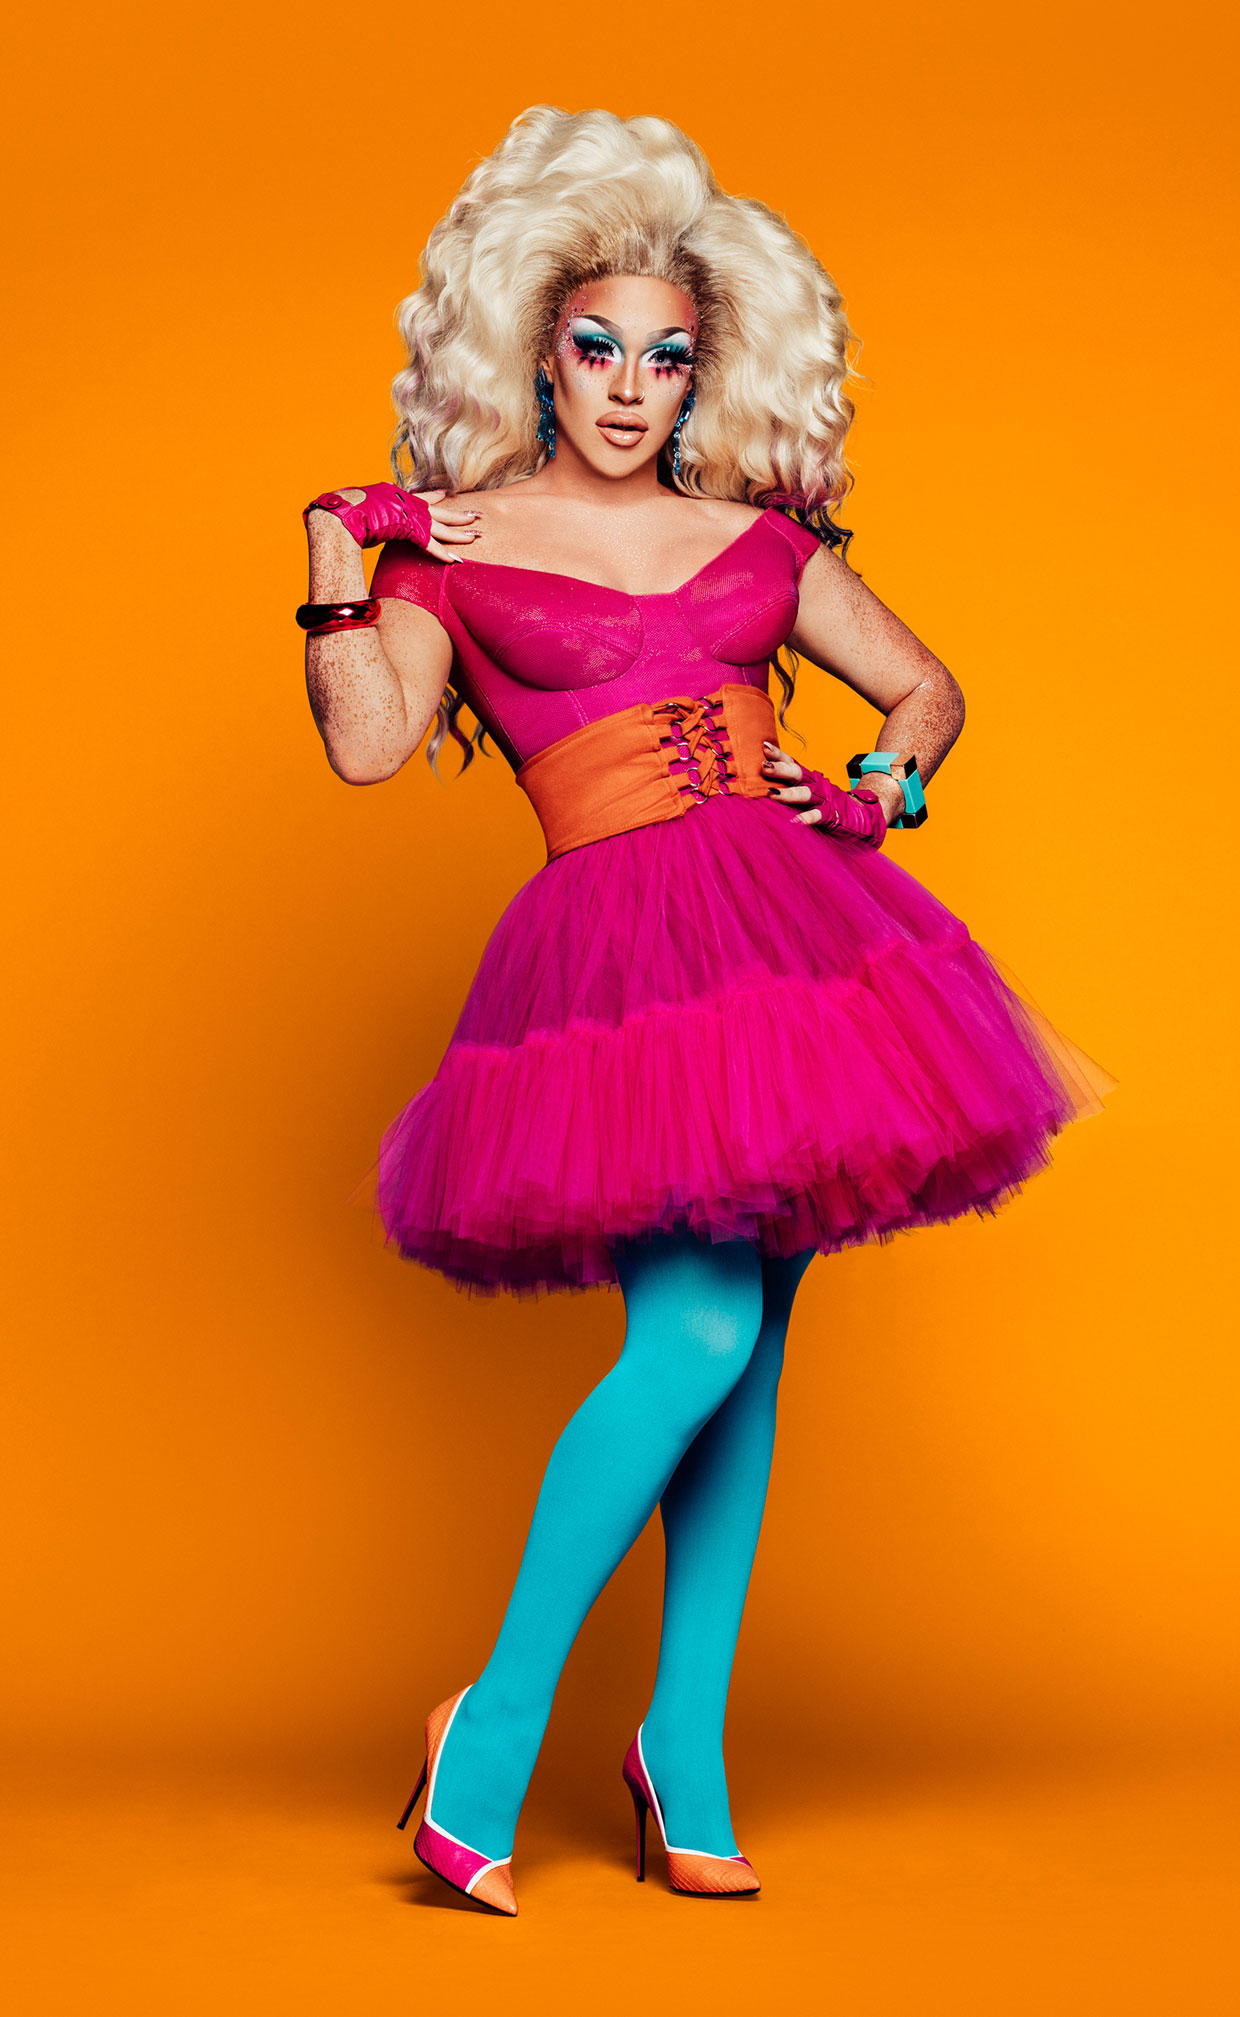 Ariel-Versace-rupaul-season-11-a-billboard-1240.jpg